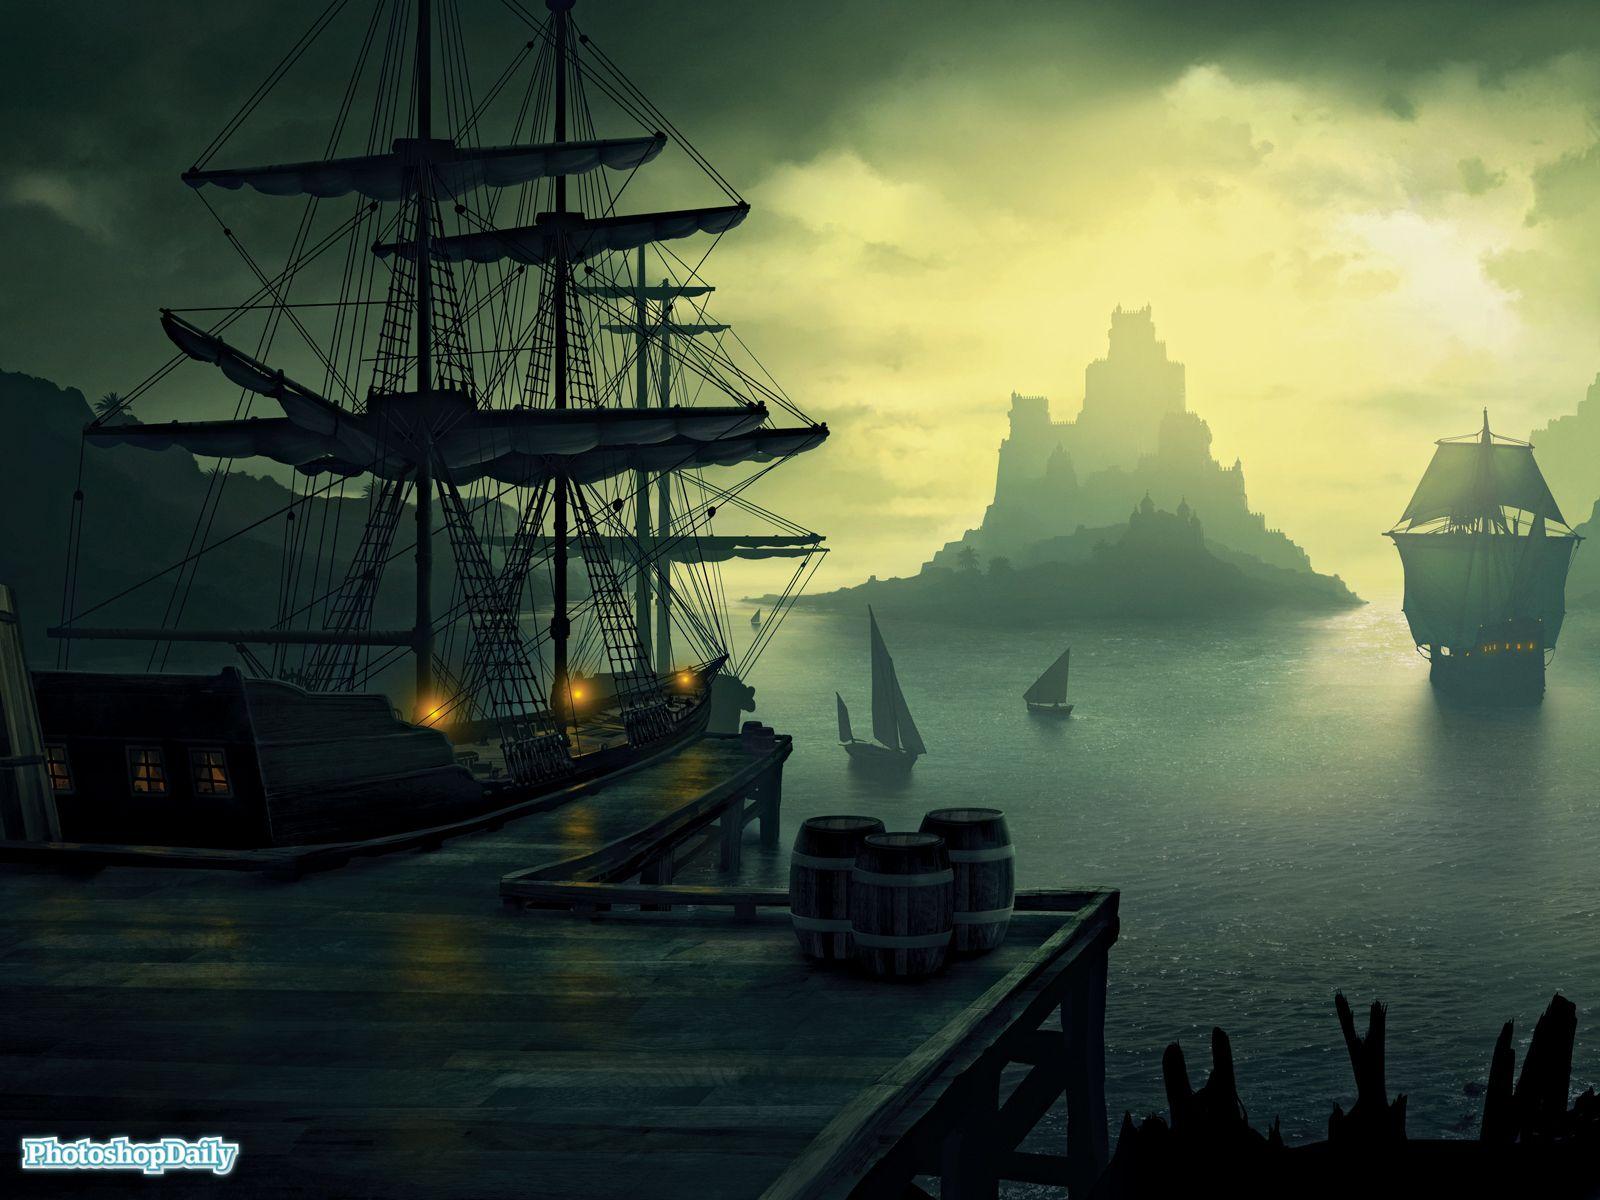 Fantasy ship cliff jolly roger pirate ship rock lightning wallpaper - Pirate Ship Wallpaper Http Wallpaperzoo Com Pirate Ship